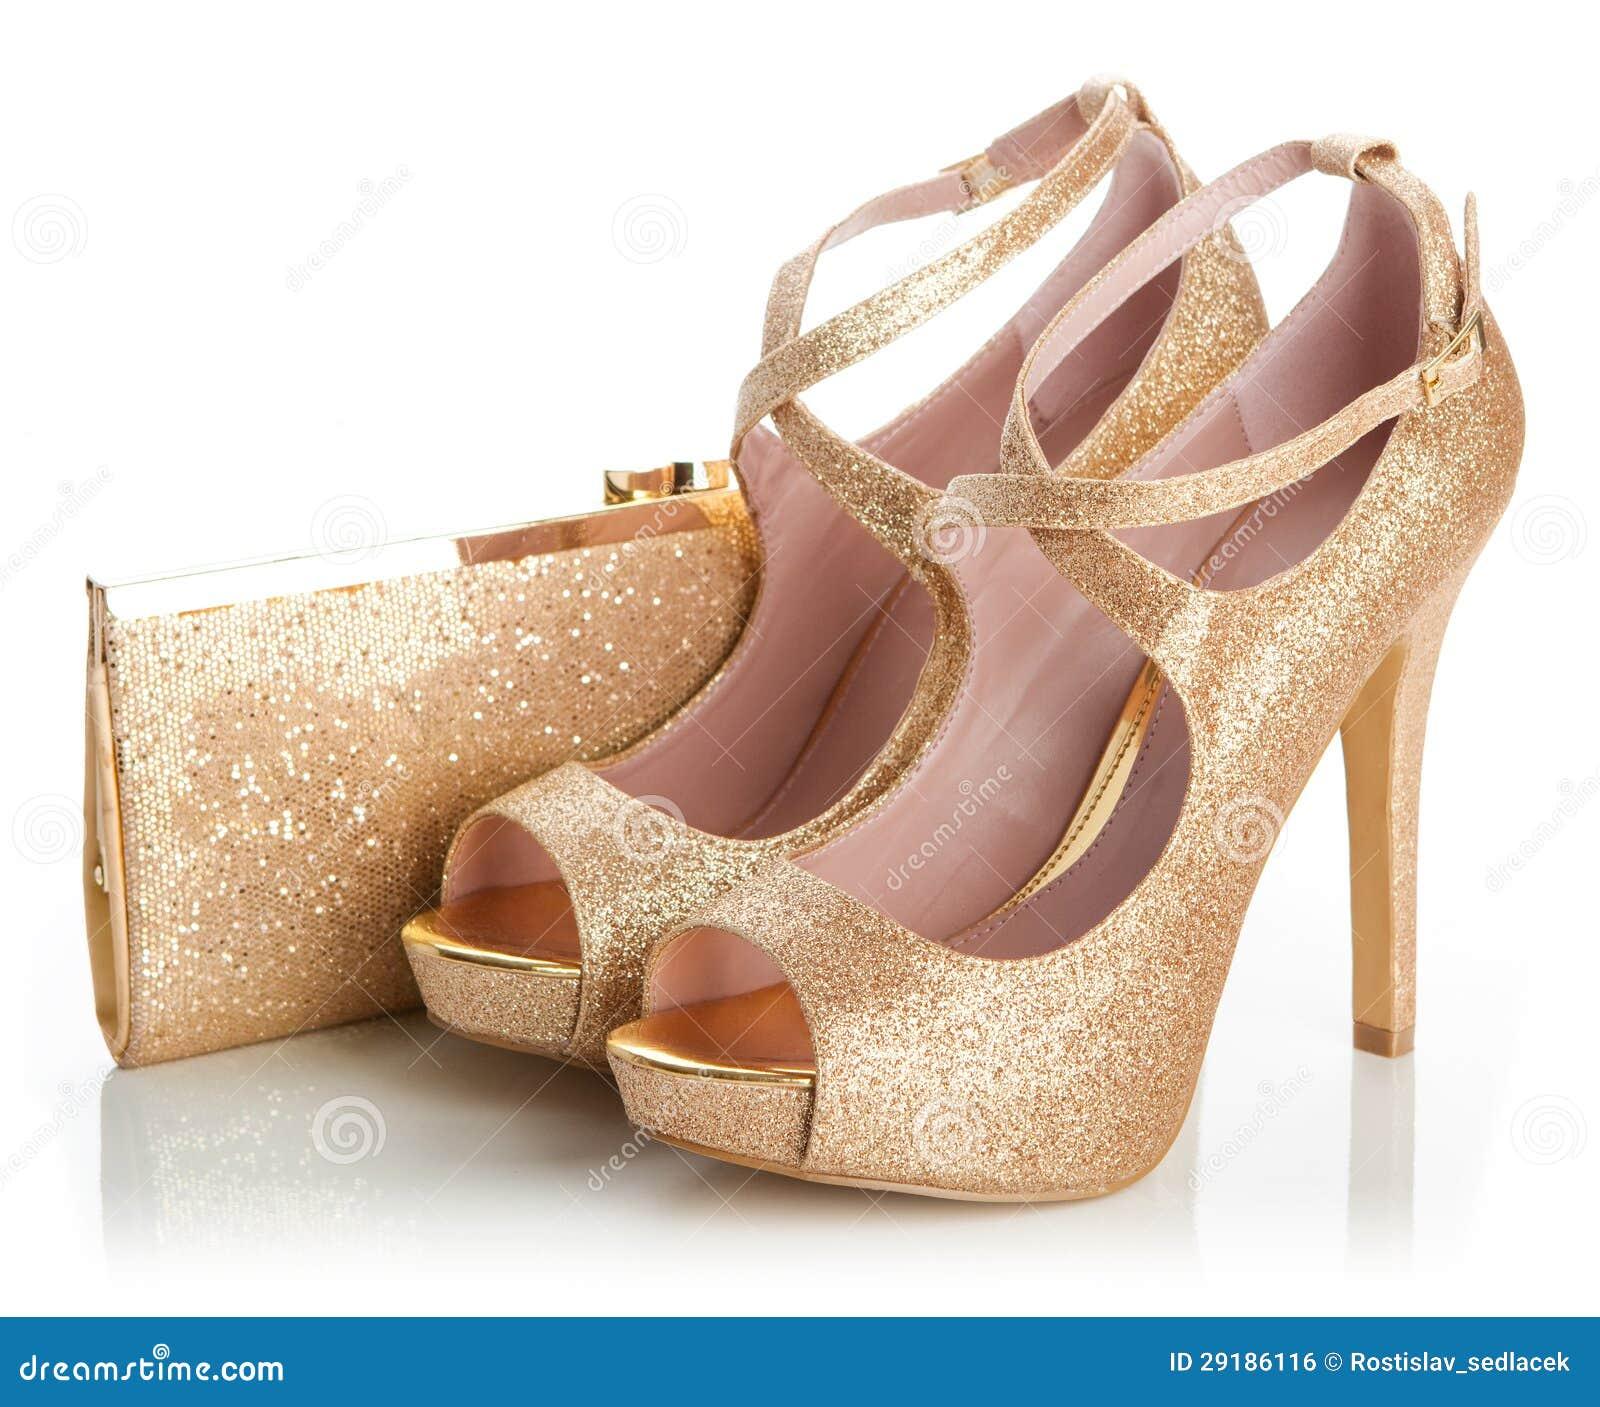 Crystal Gold Shoes | Gold Glitzy Shoes | Lemonade Shoes